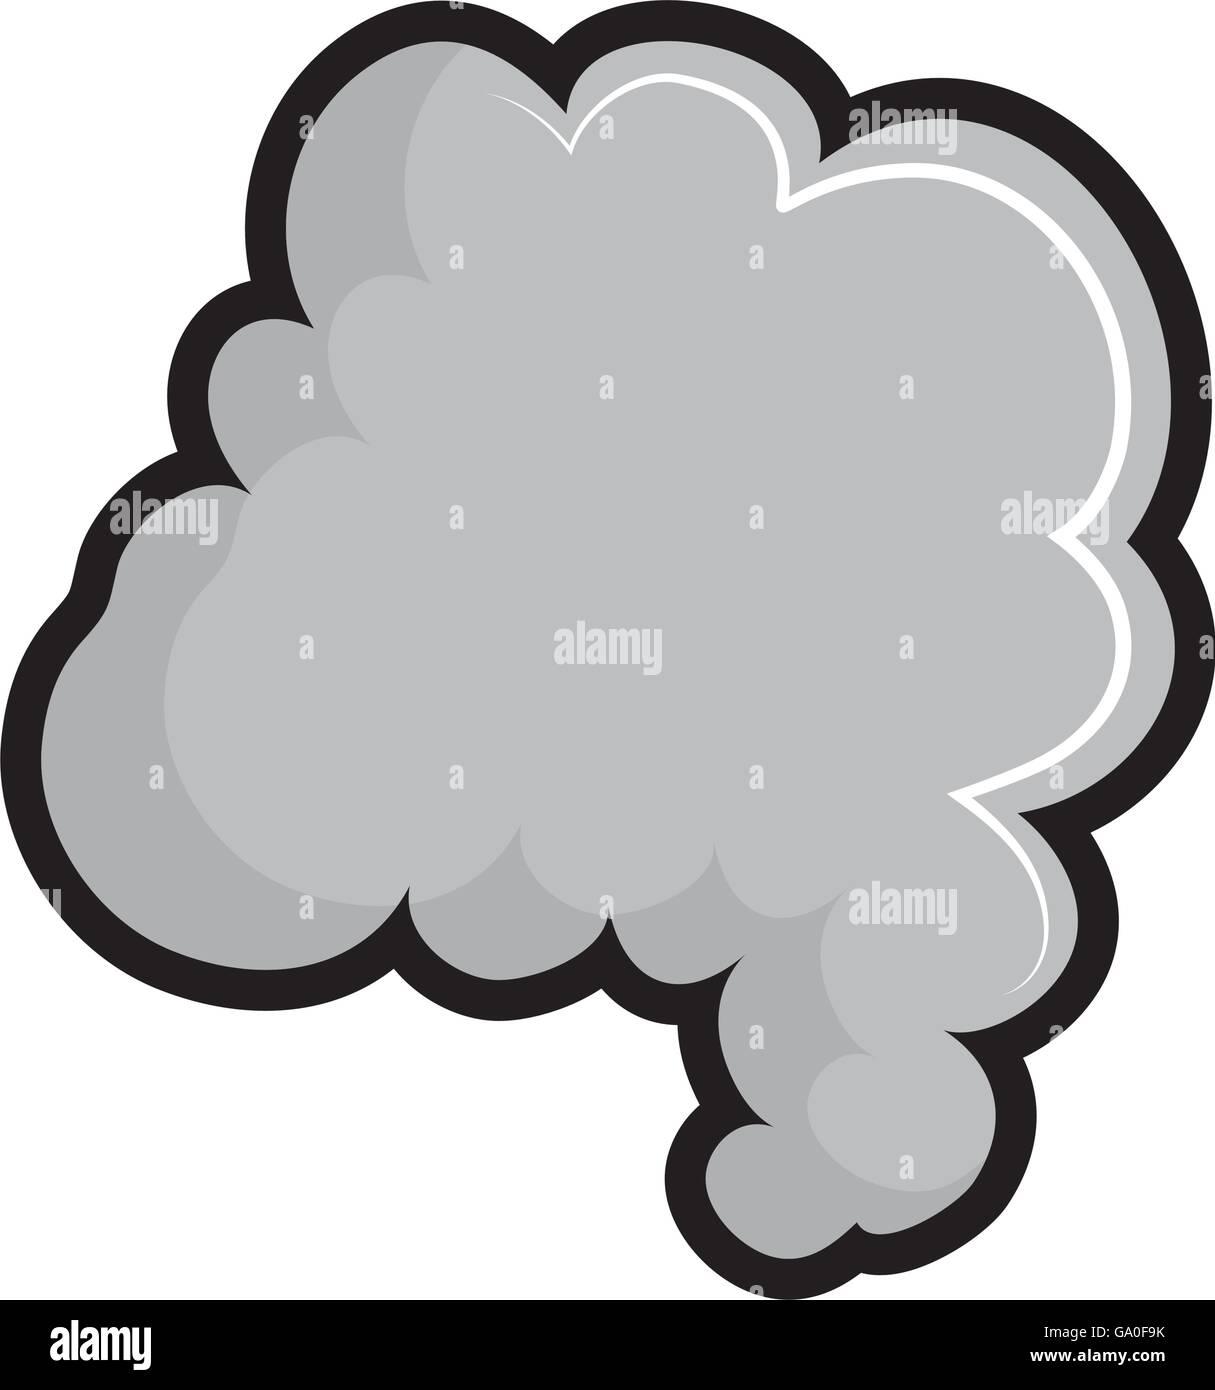 Rauch-Symbol. Nebel-Design. Vektorgrafik Vektor Abbildung - Bild ...